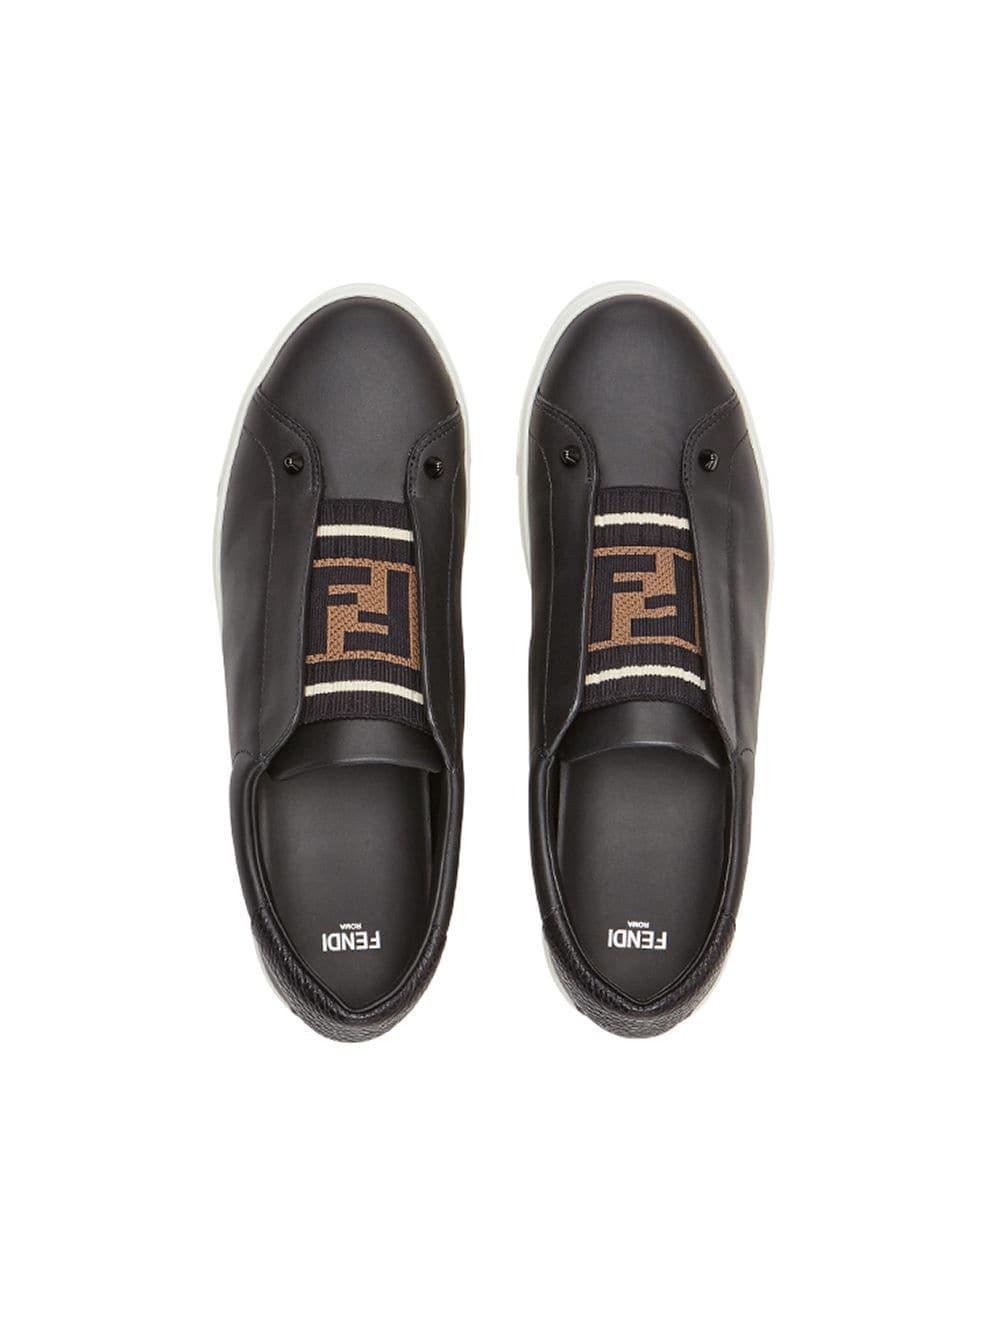 In Sneakers Zucca Fendi Slip Band On Lyst Black xav8wO